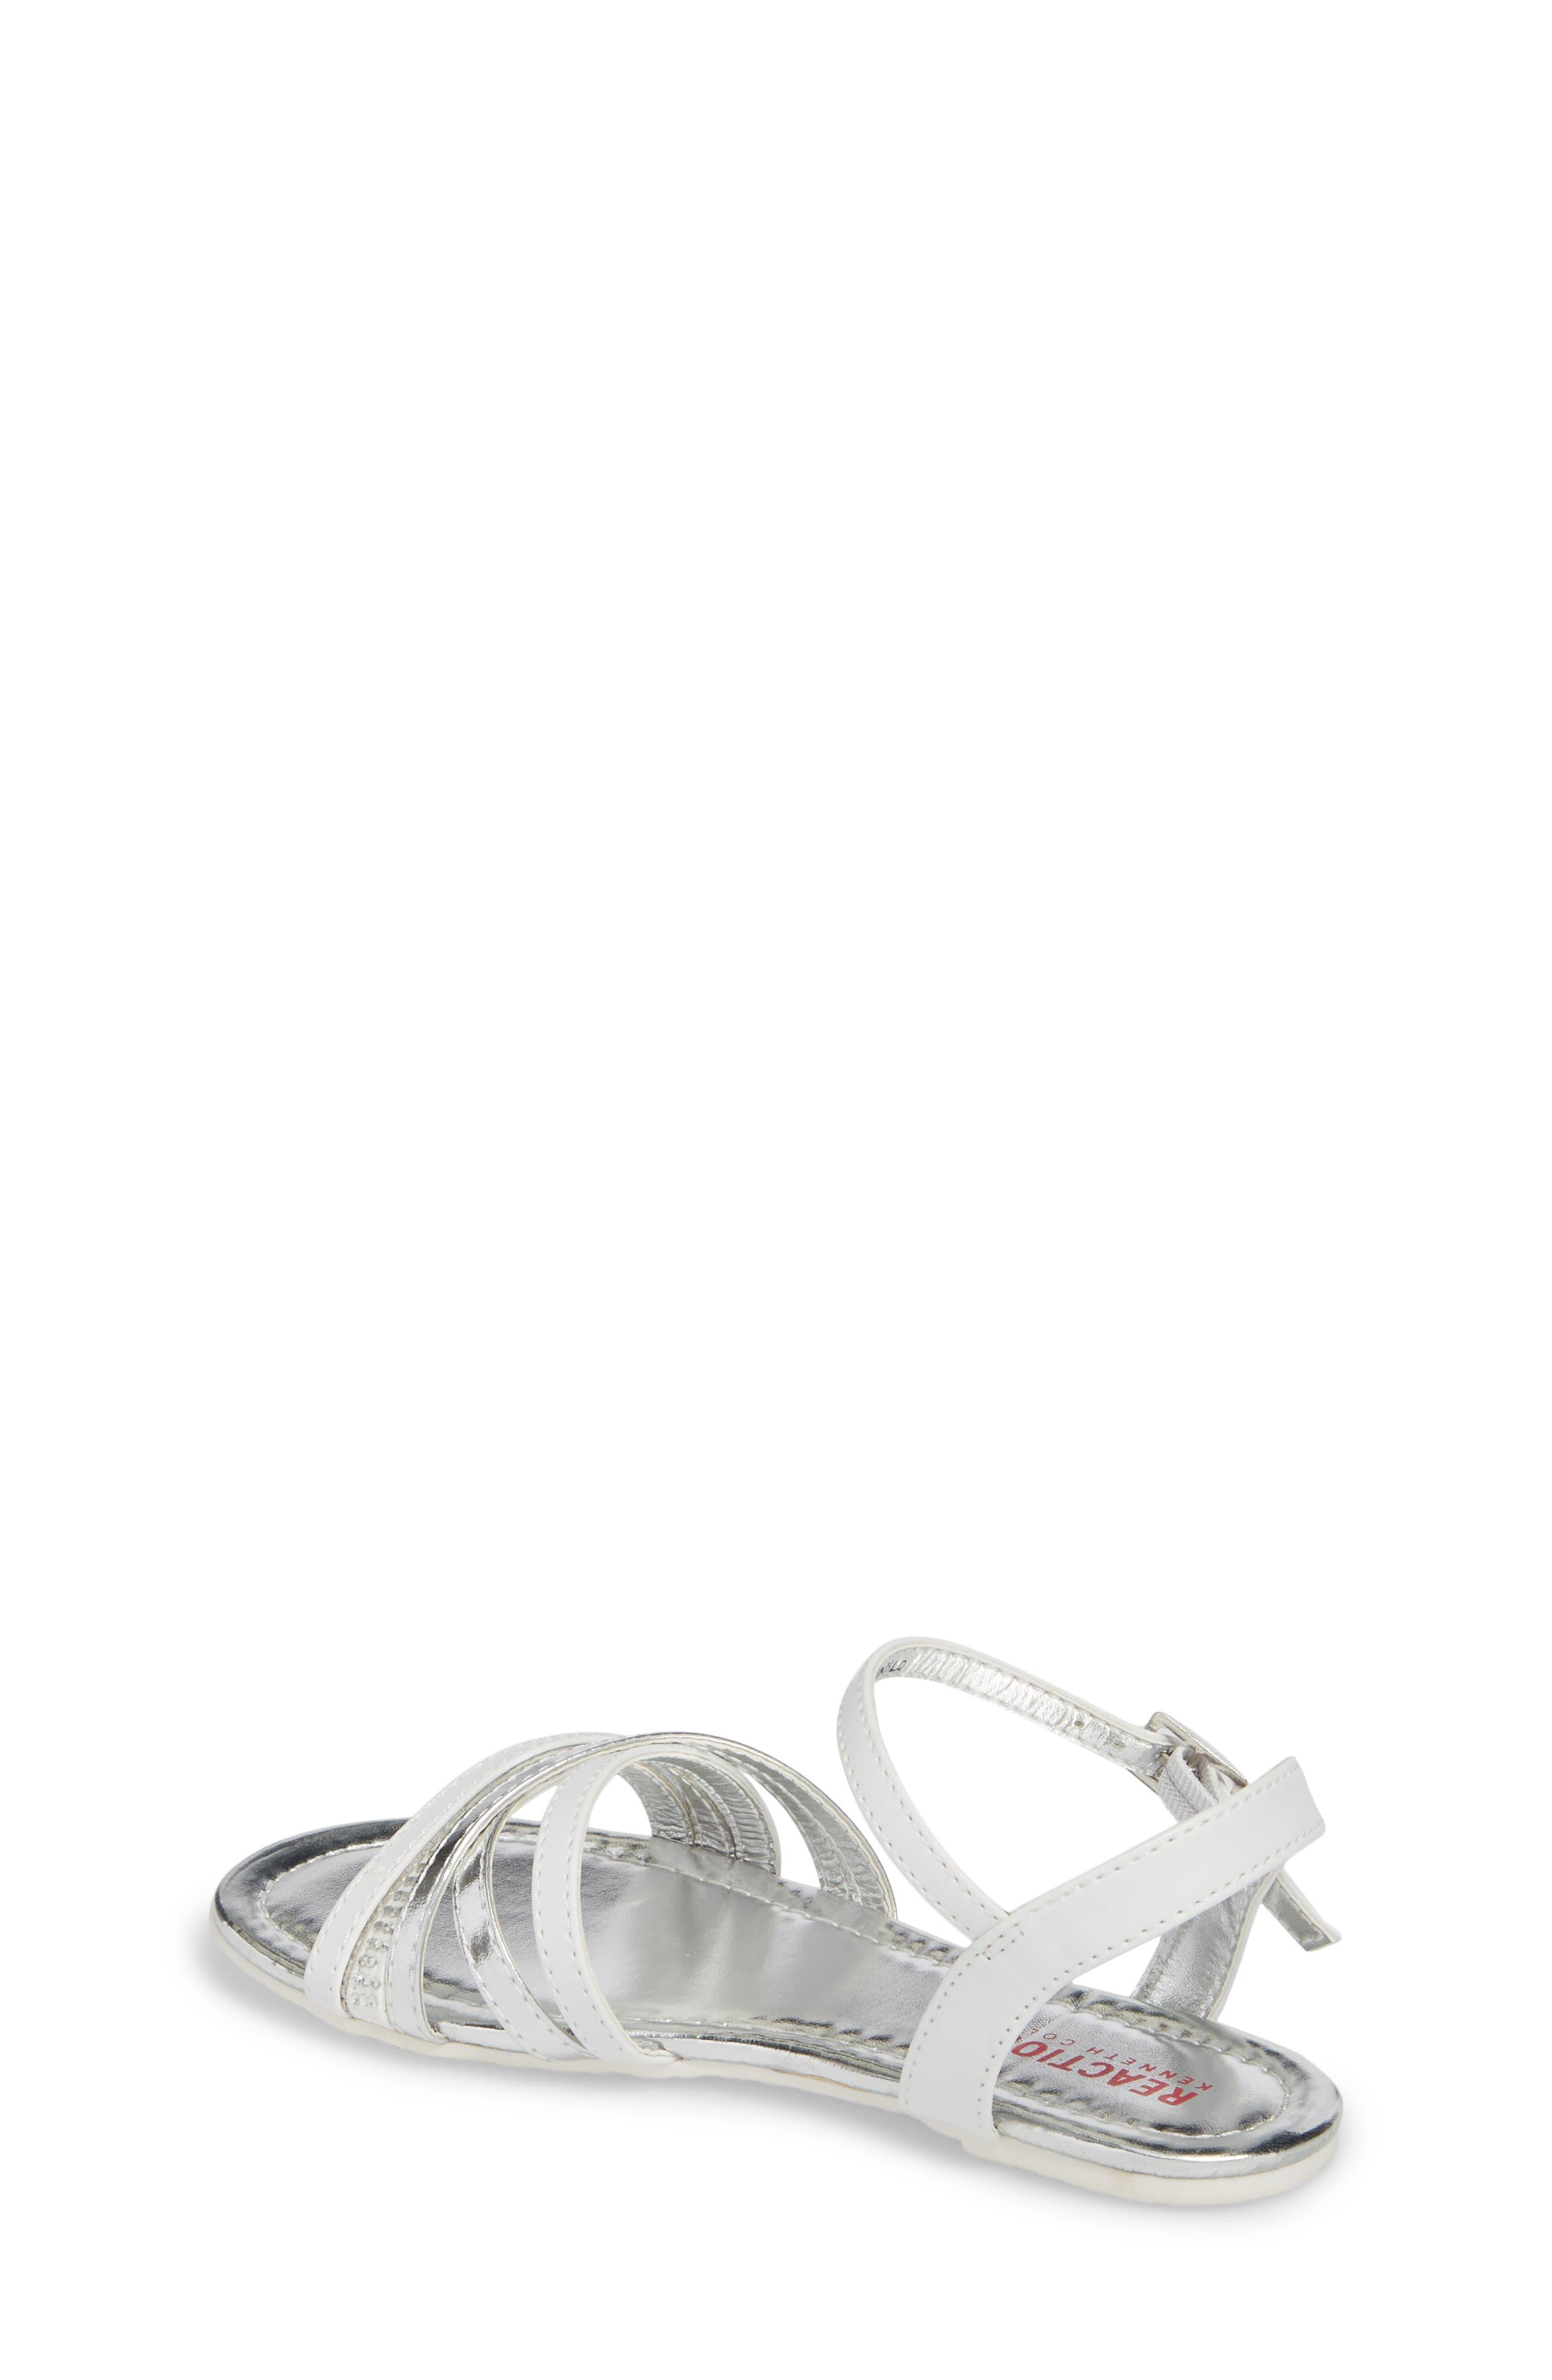 Kiera Getty Crystal Sandal,                             Alternate thumbnail 2, color,                             White